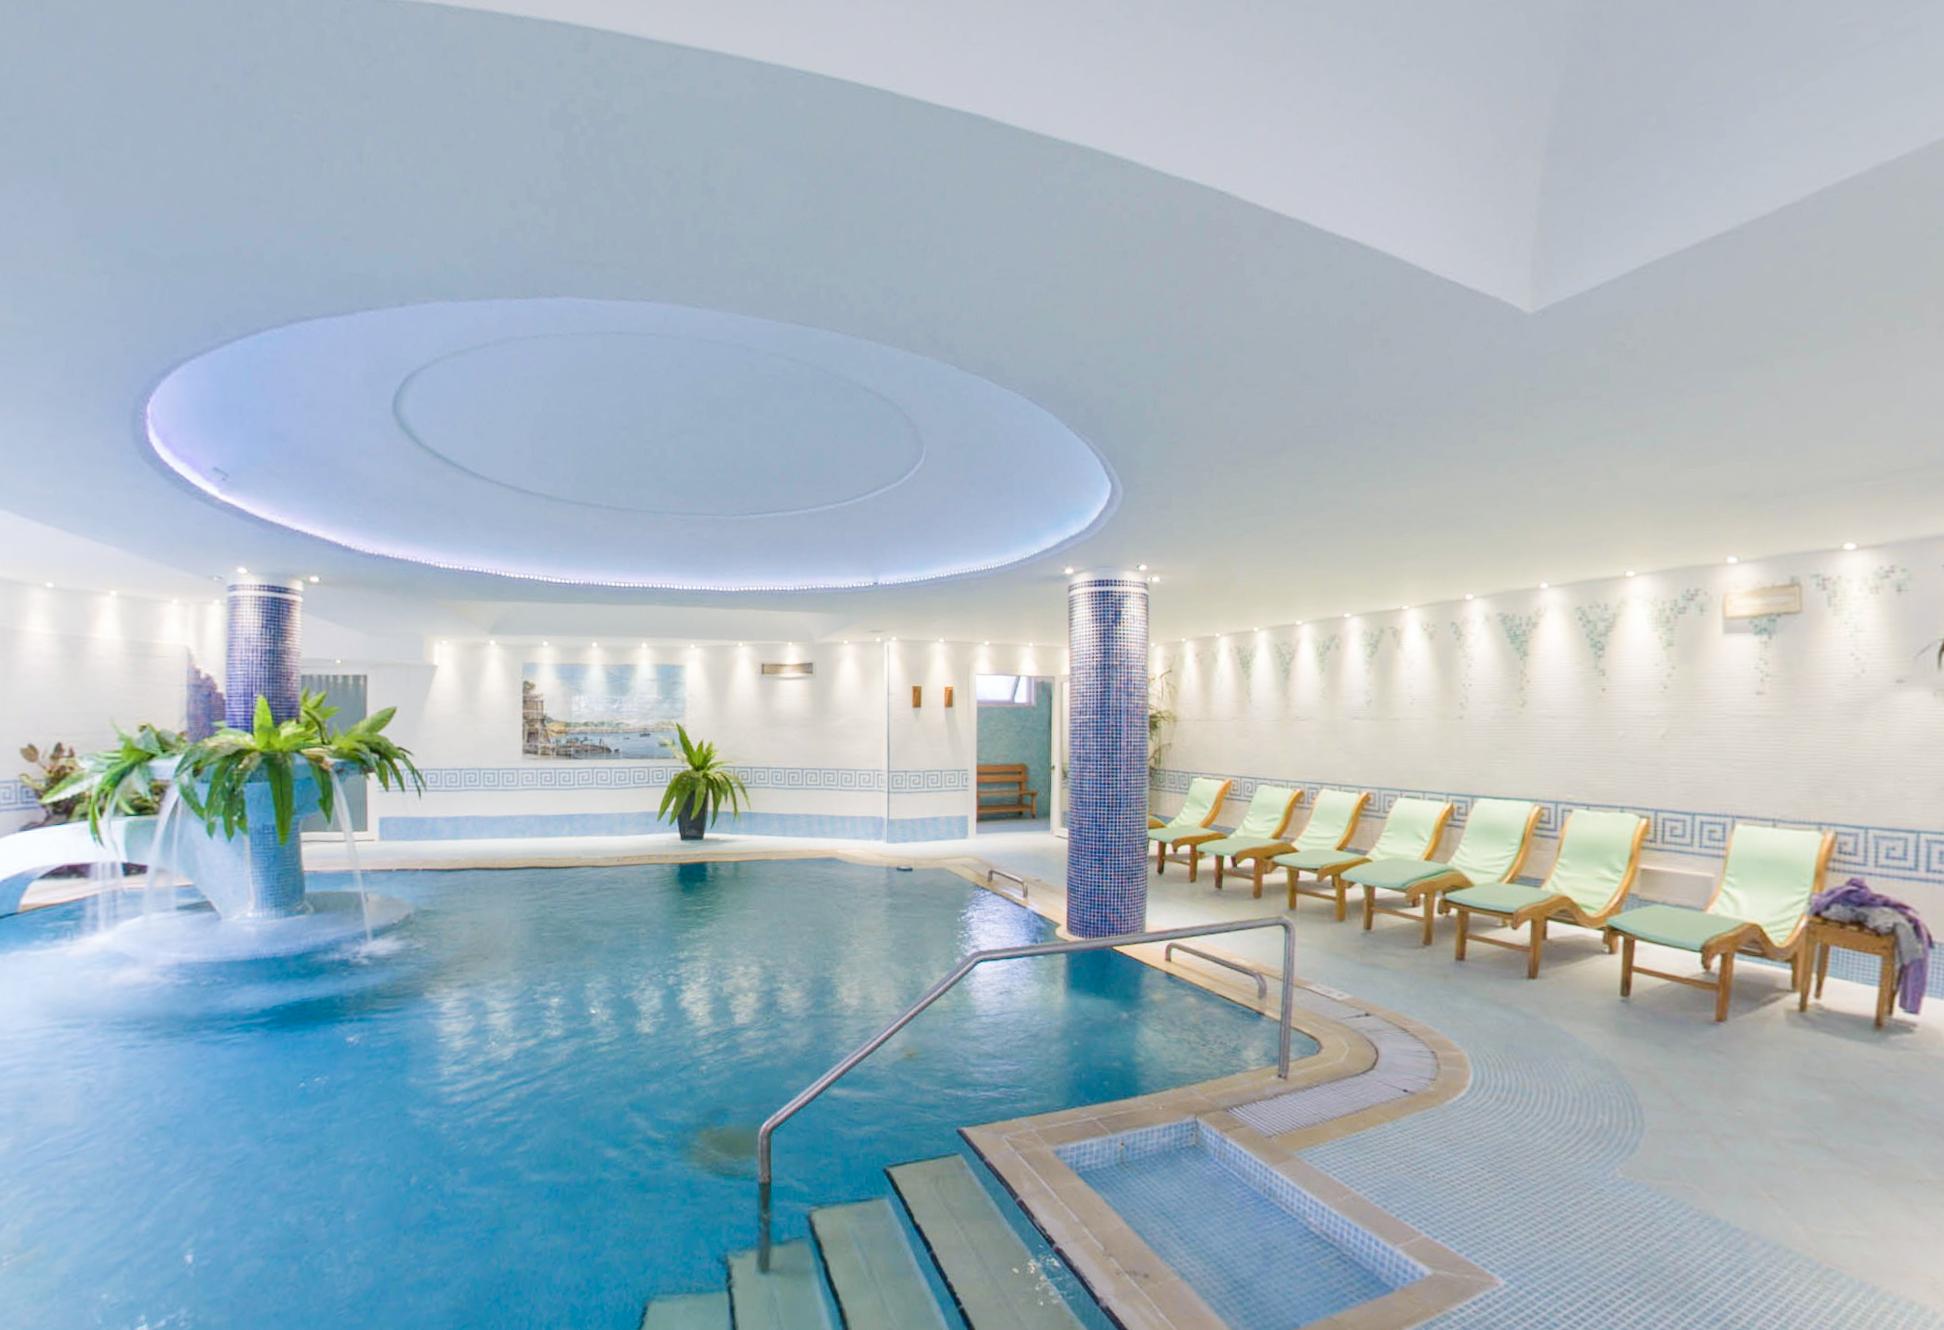 hotel-continental-terme-ischia-piscina-interna_